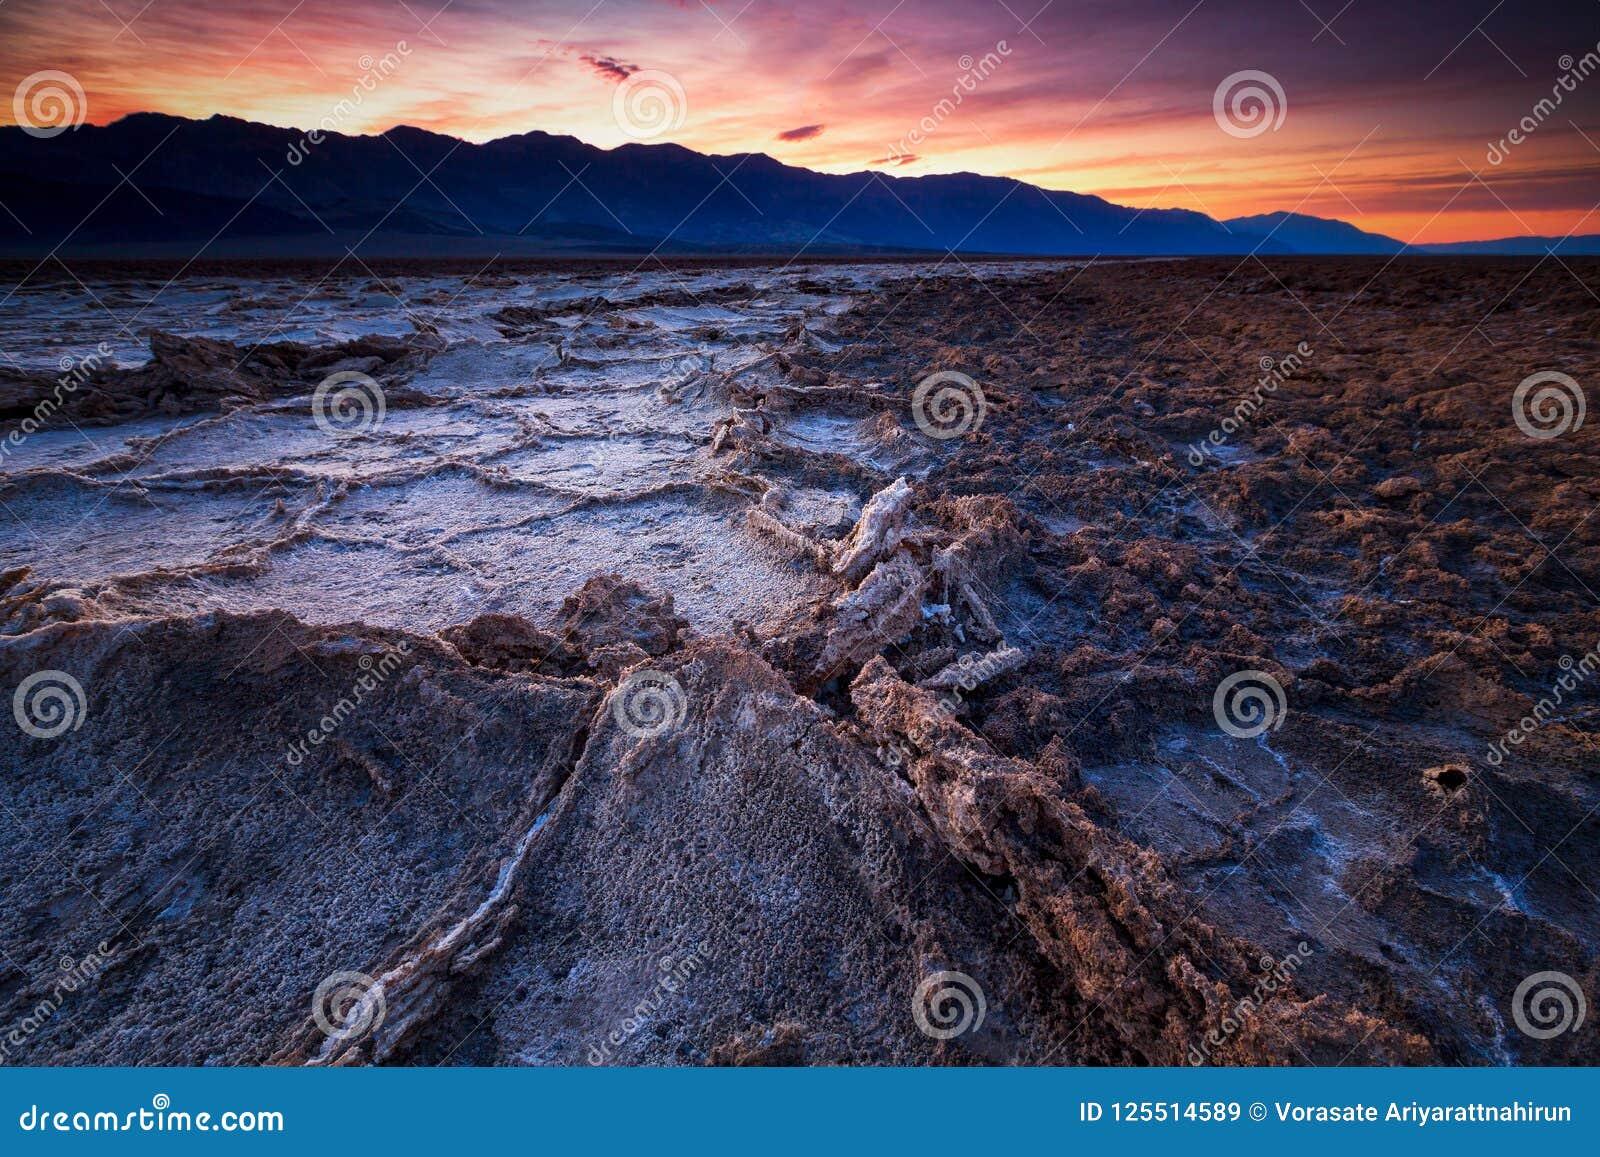 Badwater basin, Death Valley, California, USA.